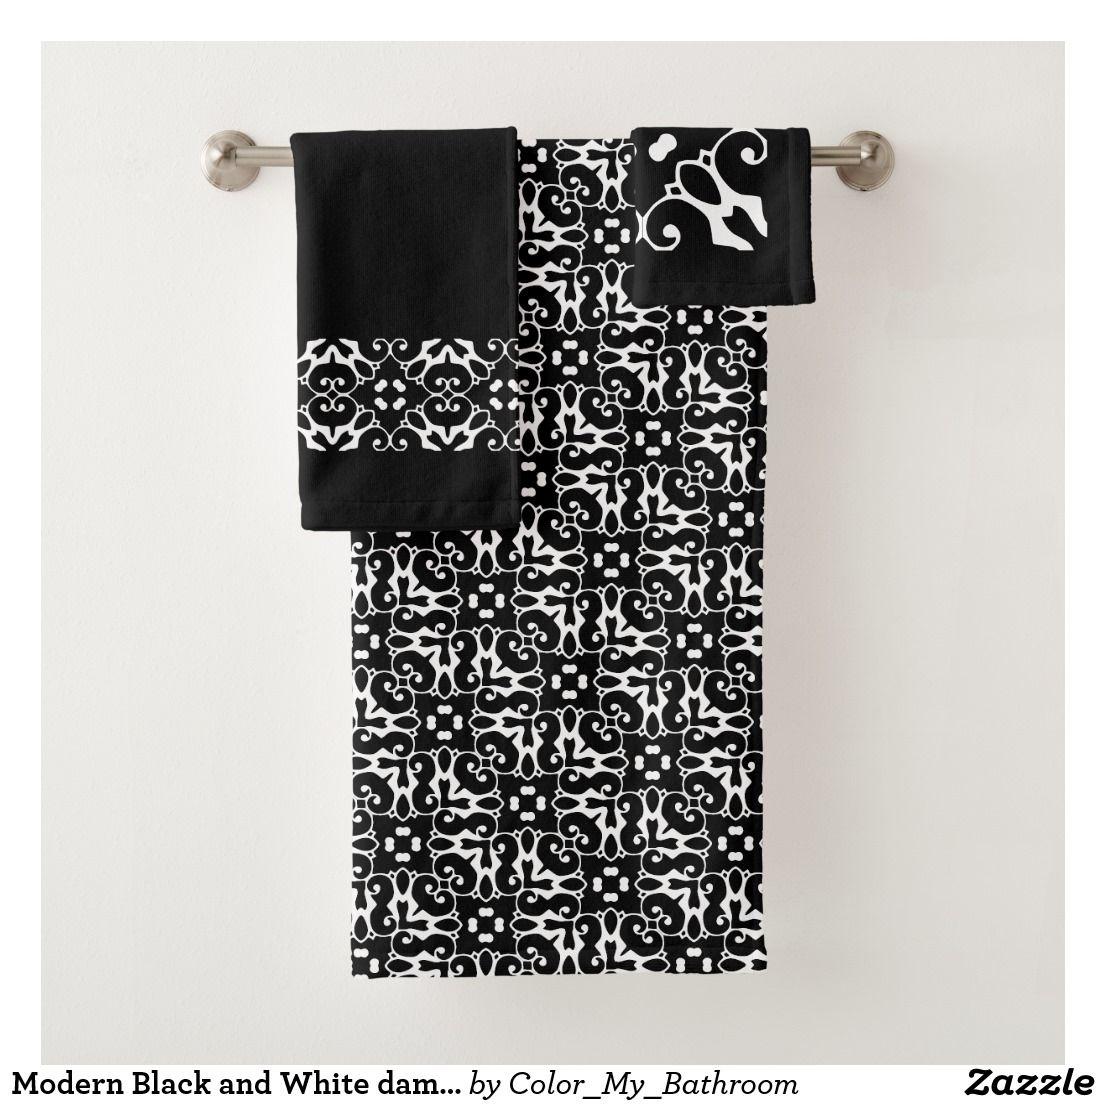 Modern Black And White Damask Bathroom Bath Towel Set Zazzle Com